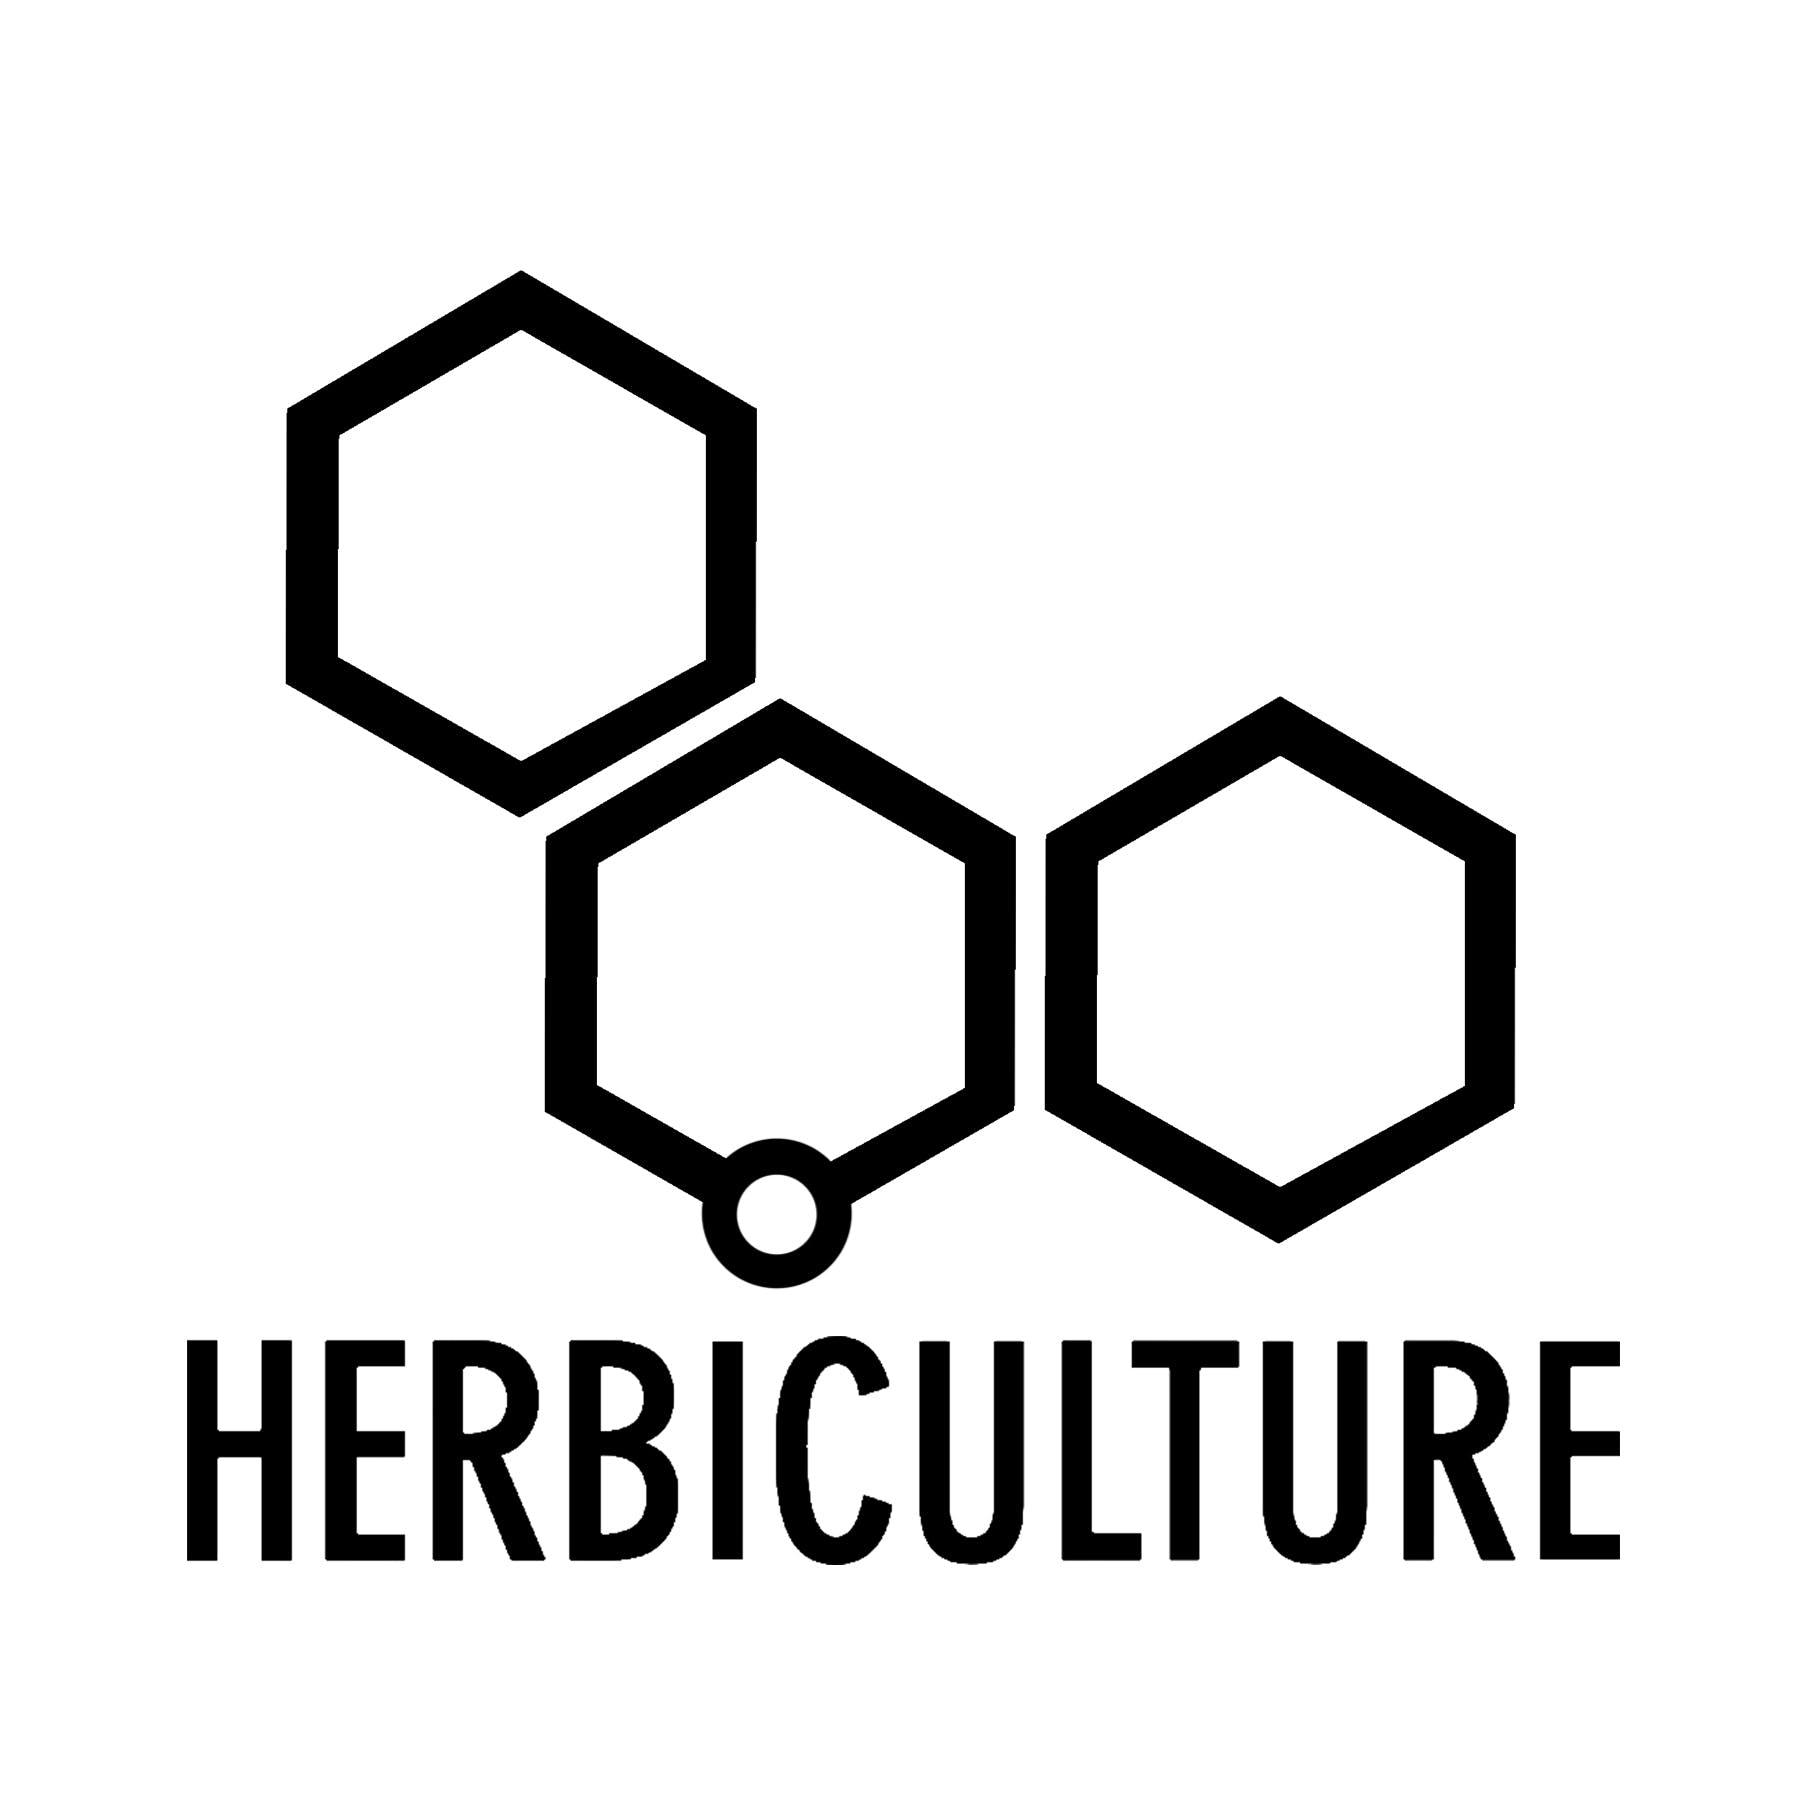 Herbiculture | Store